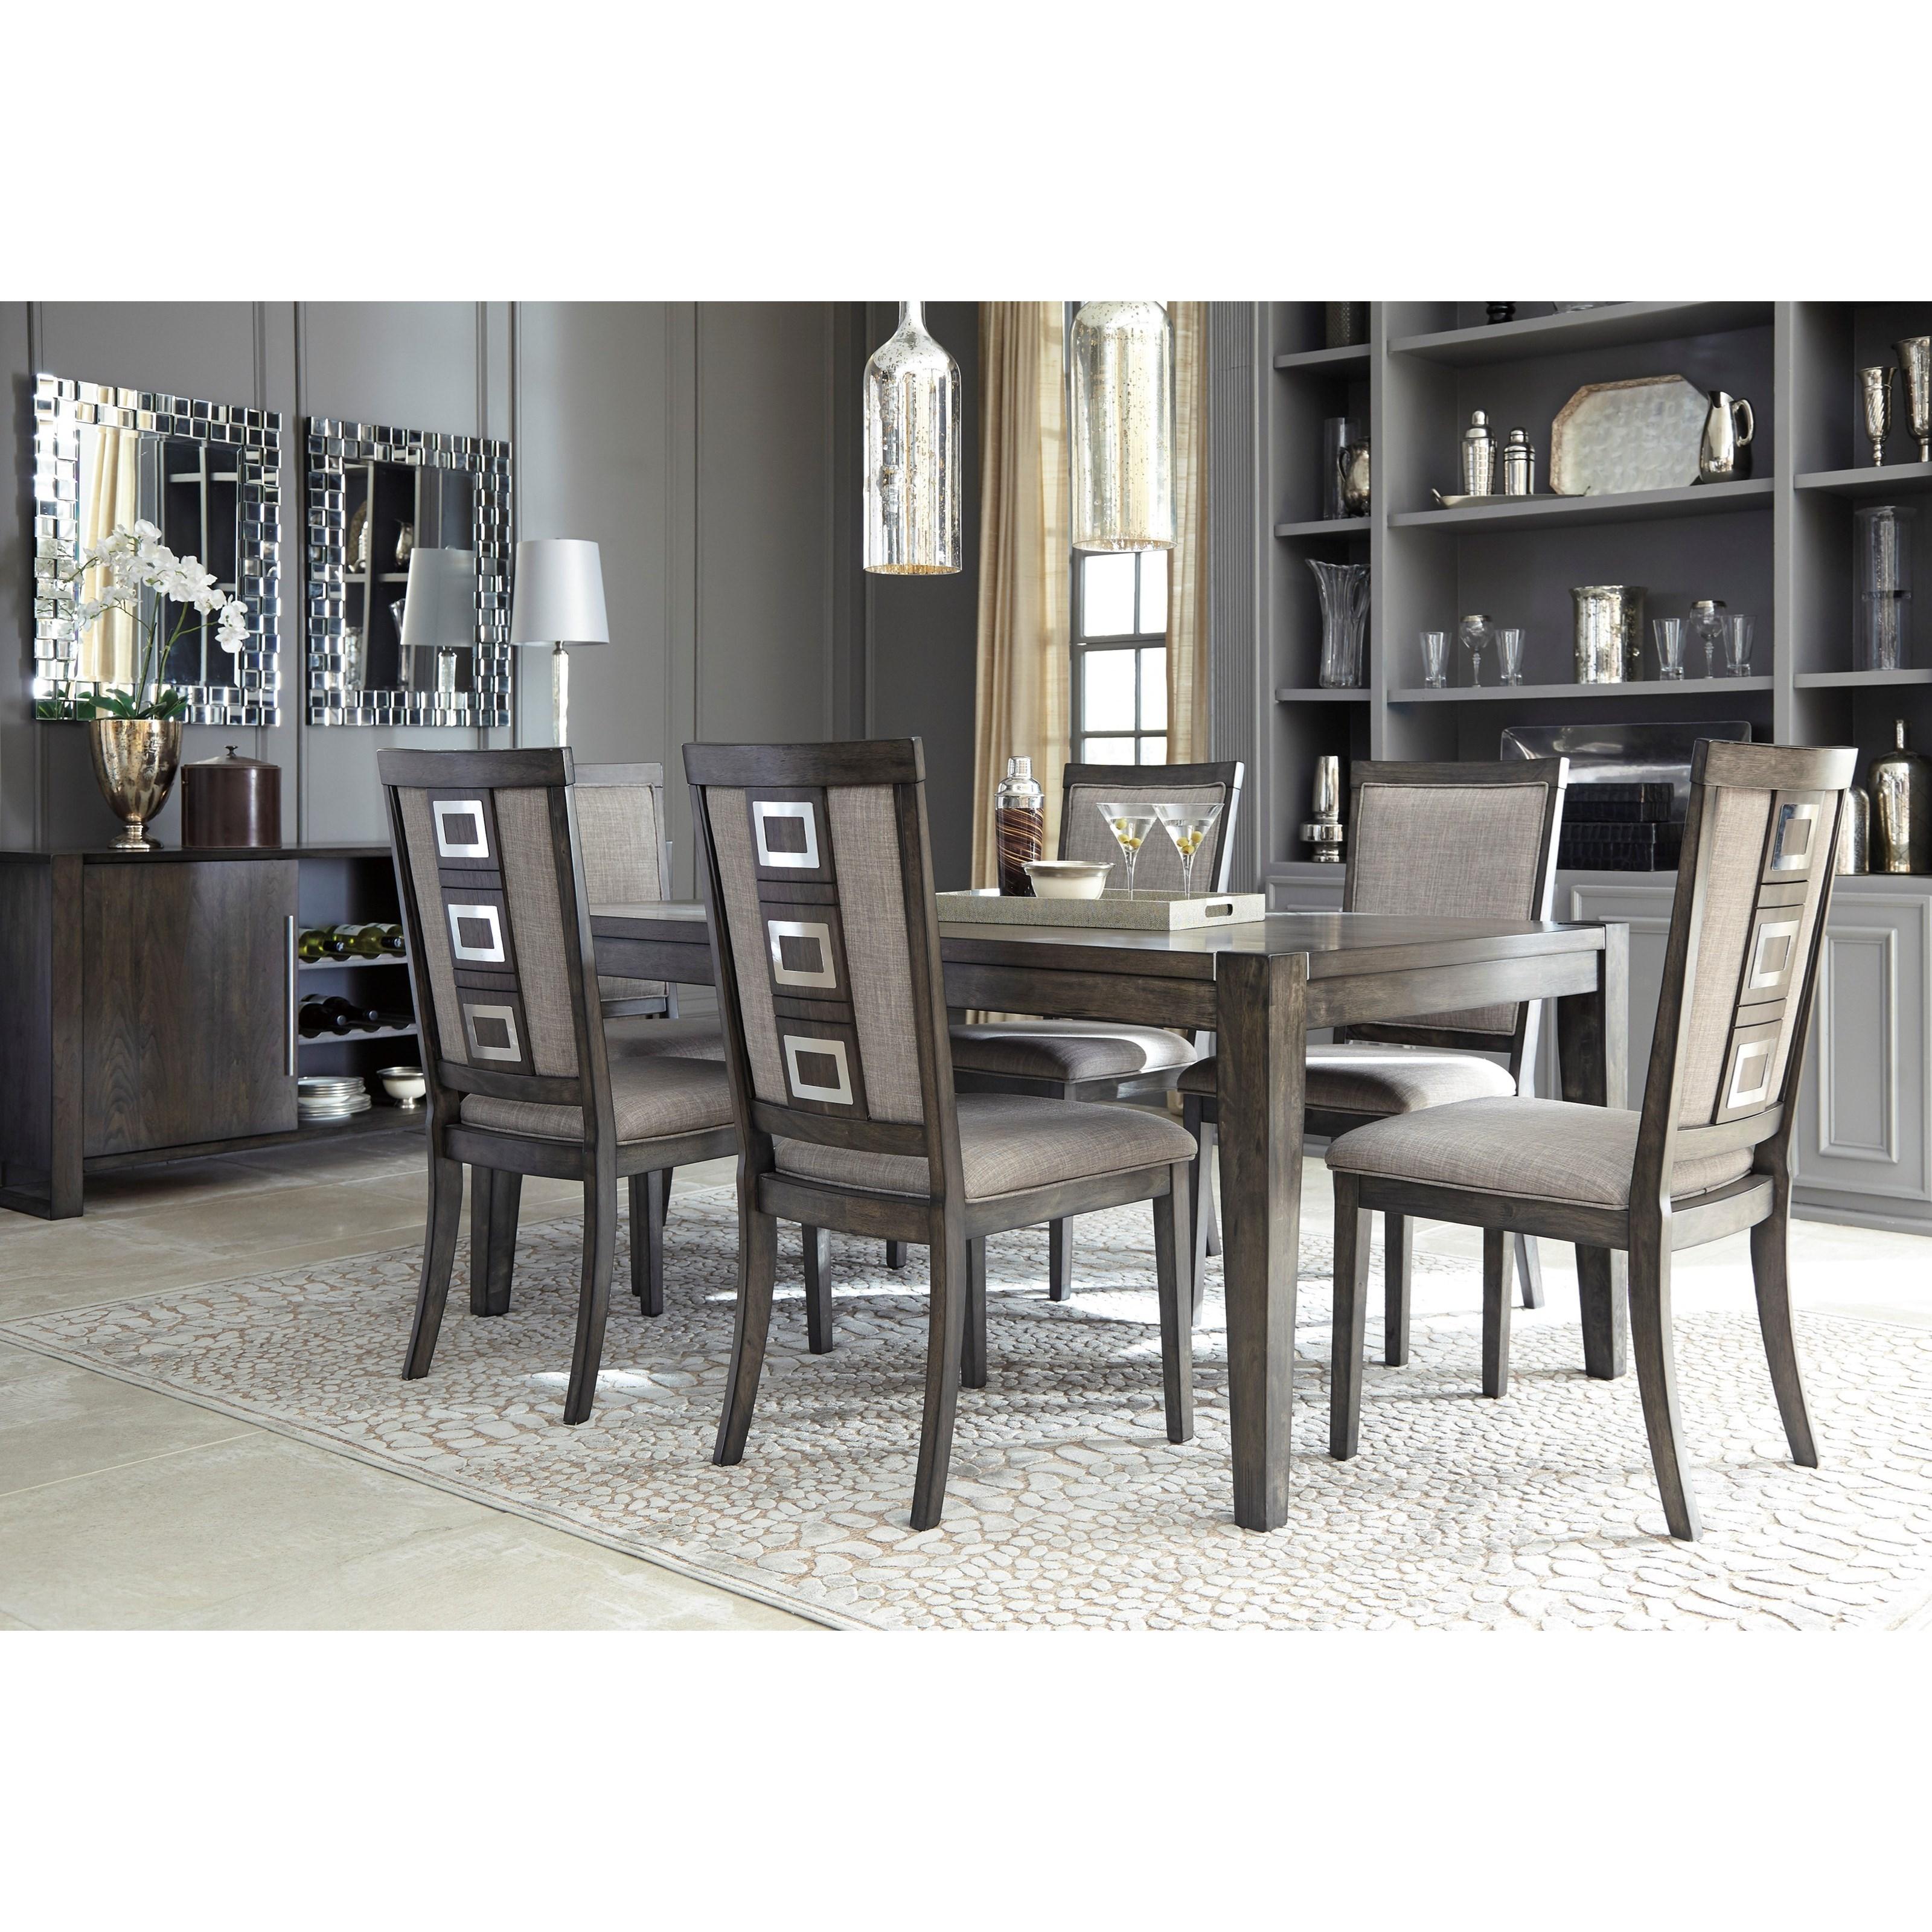 Server Room Furniture : Ashley signature design chadoni d contemporary